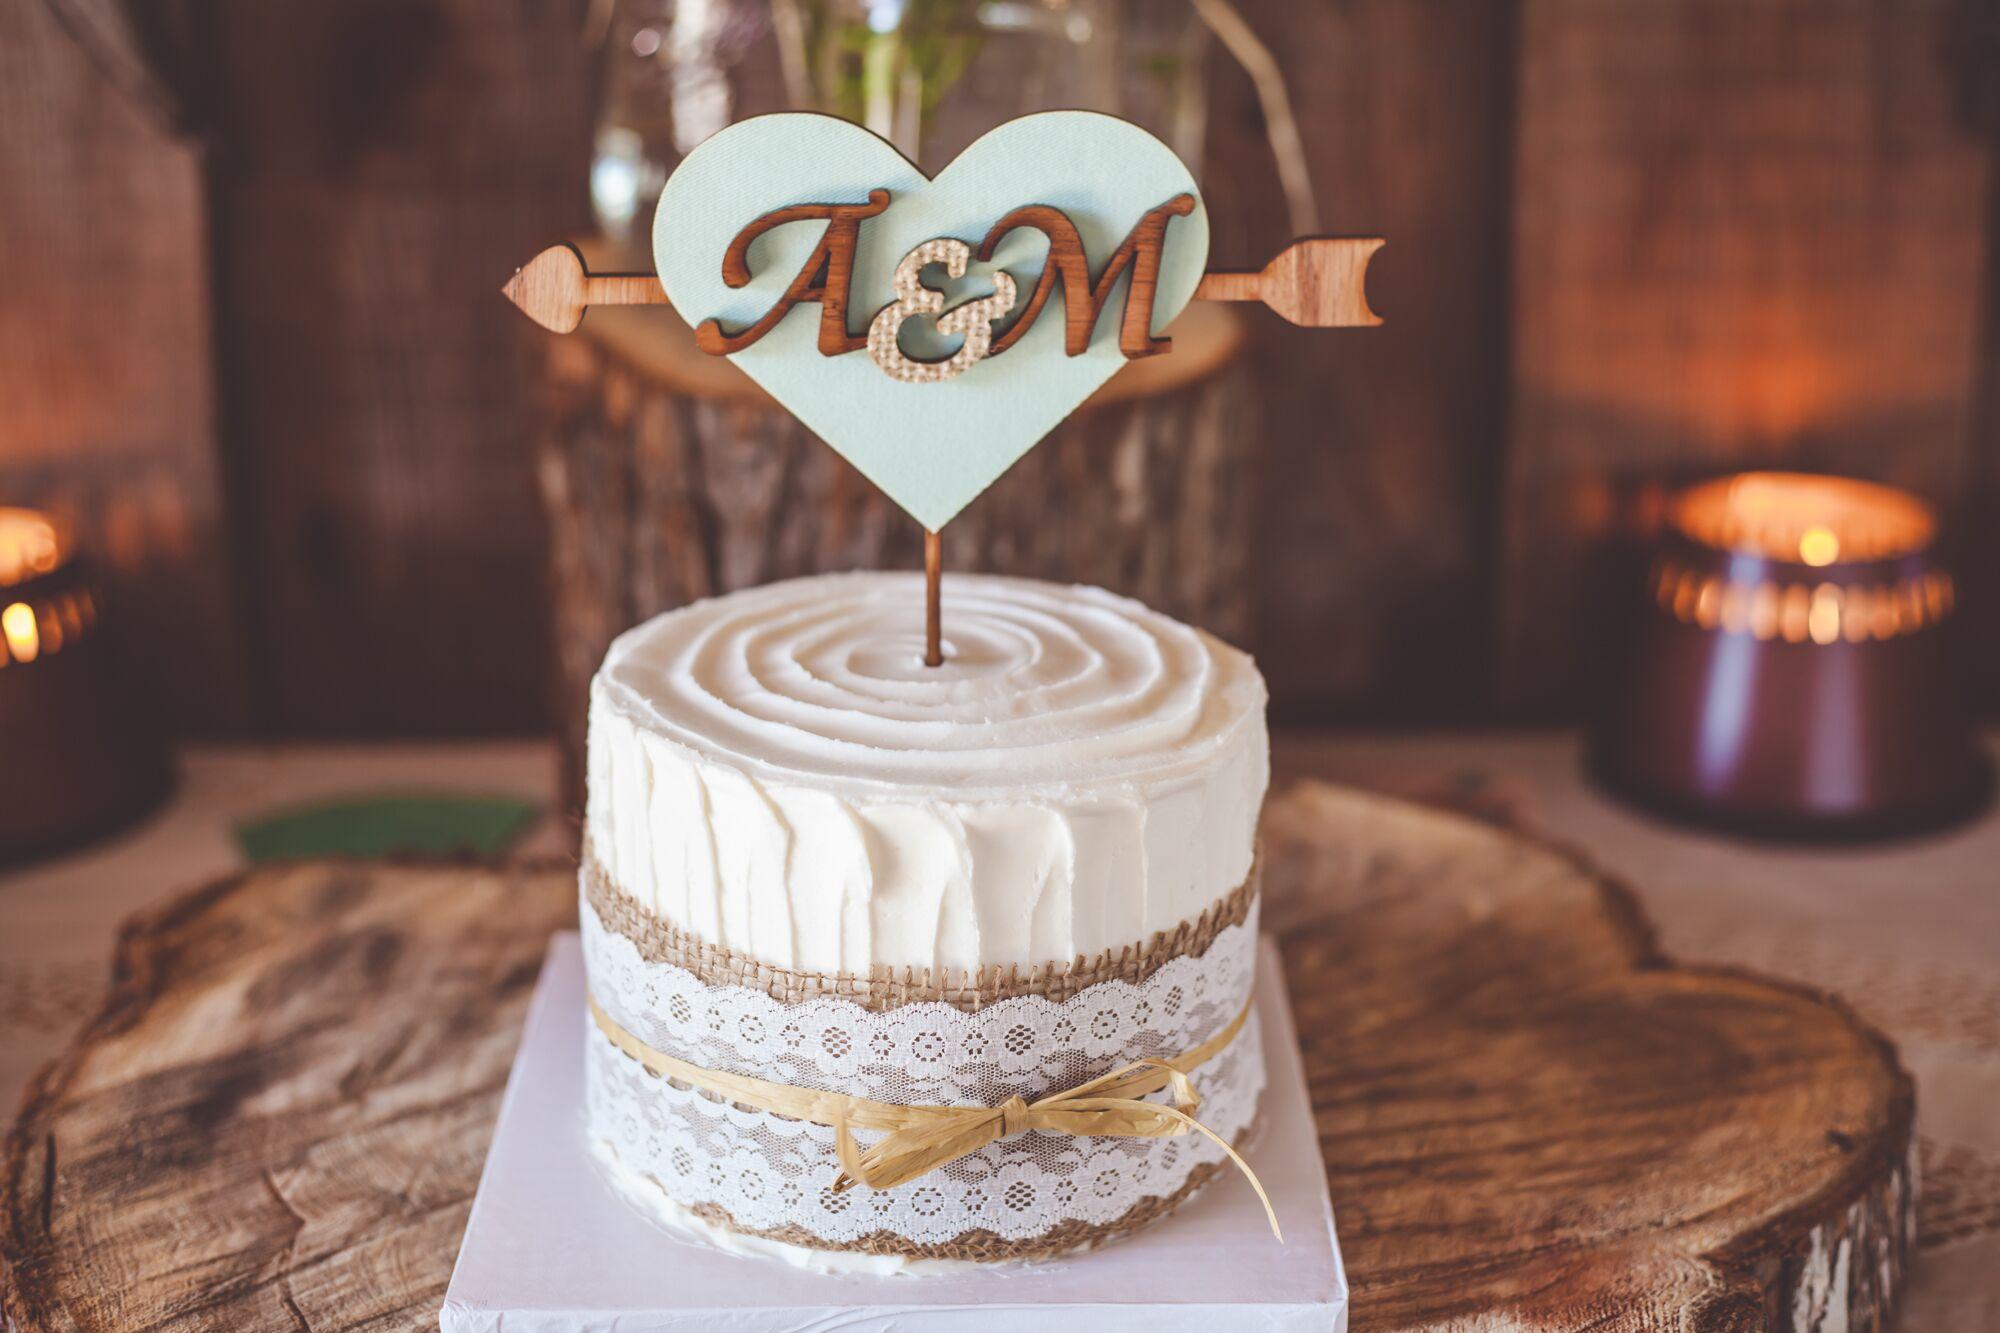 Single Tier Wedding Cake with Fun Arrow Topper